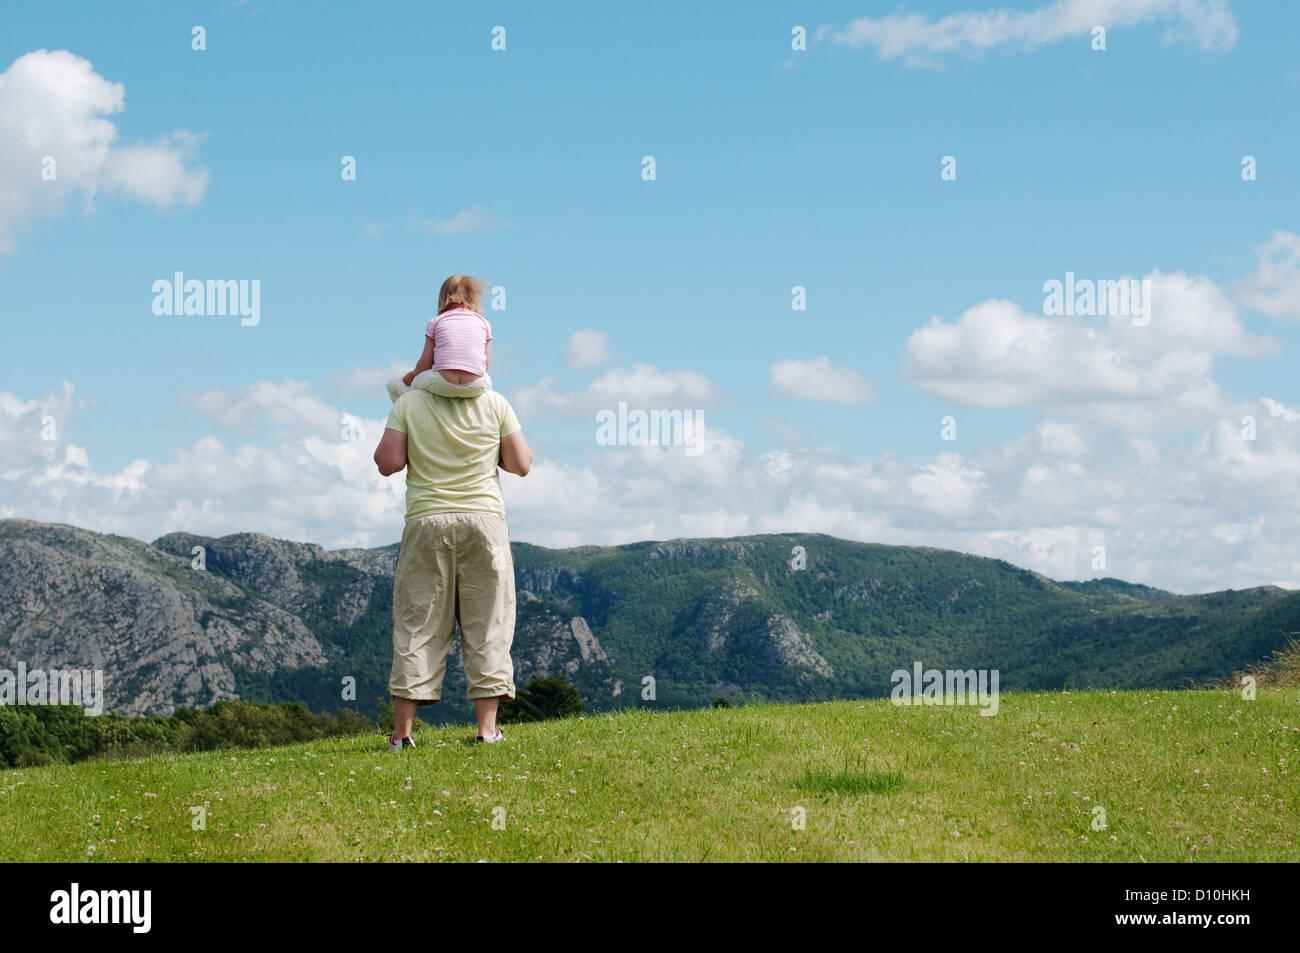 Vater Holding Kind auf Schultern Blick auf Berge Stockbild